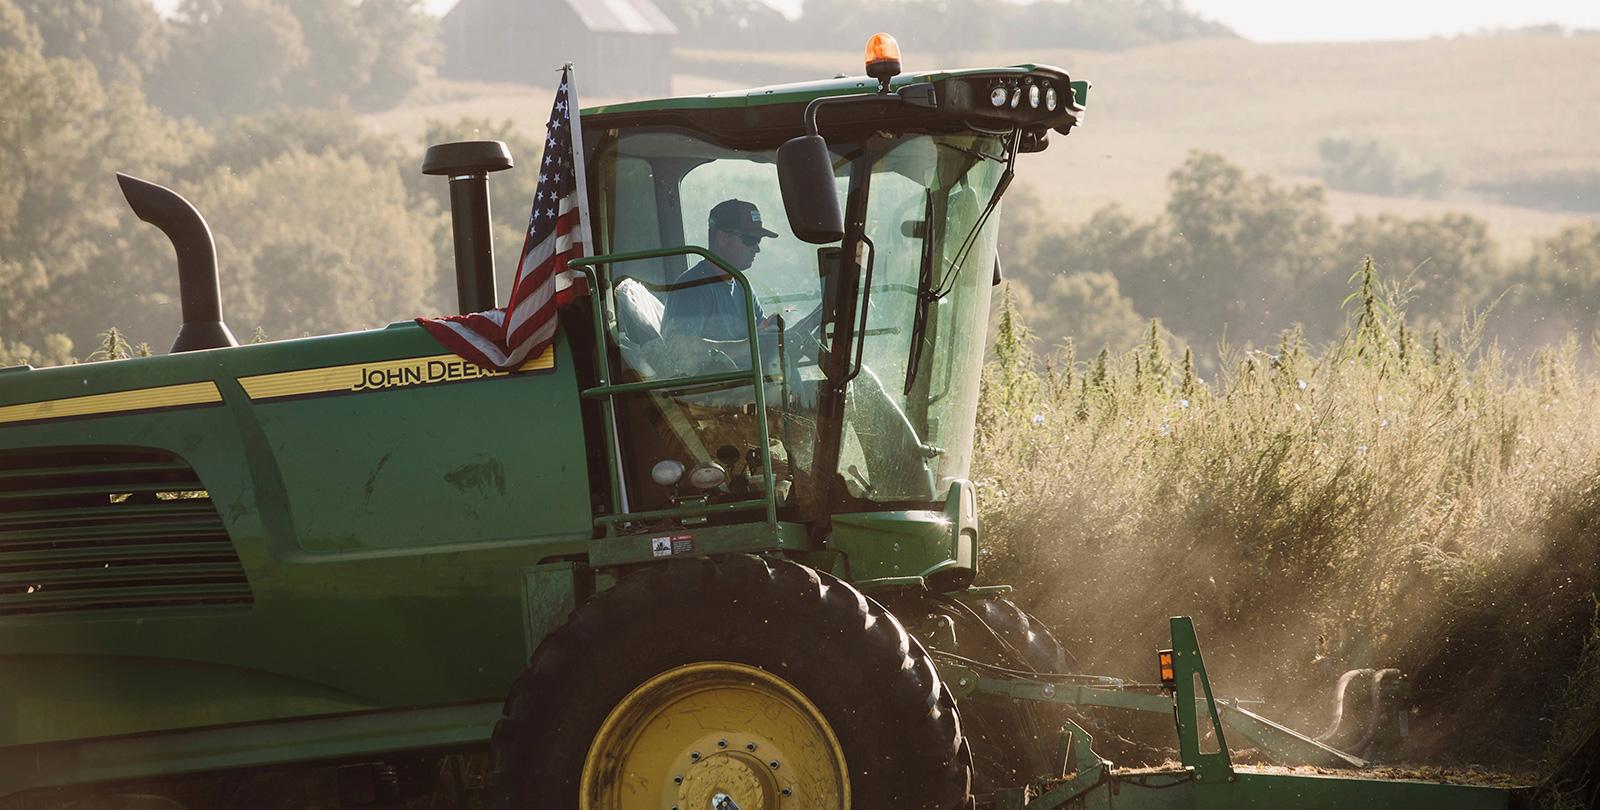 Remington operating a John Deere tractor on our hemp farm in Buchanan County.